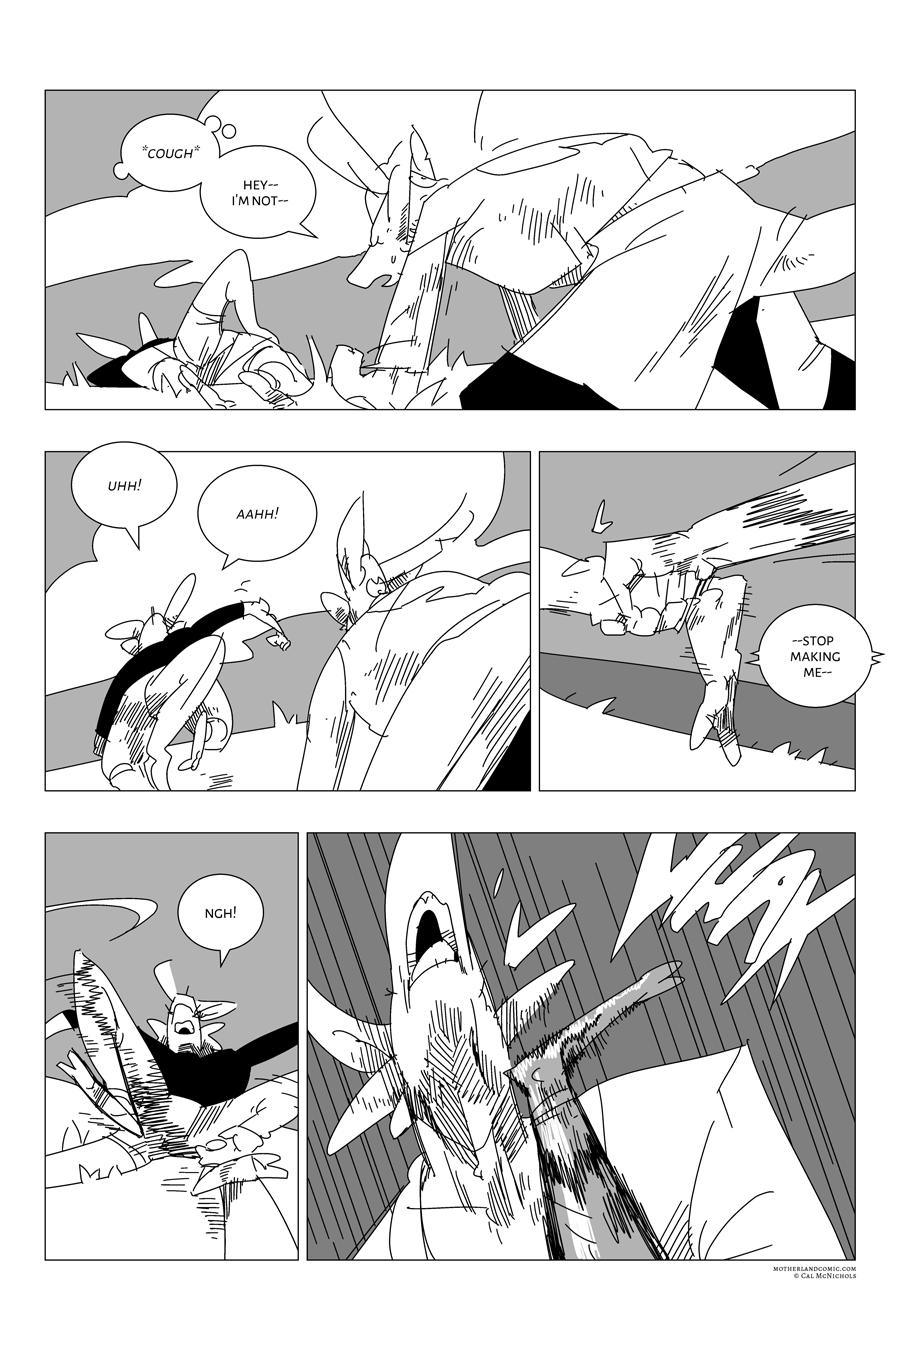 pg 100